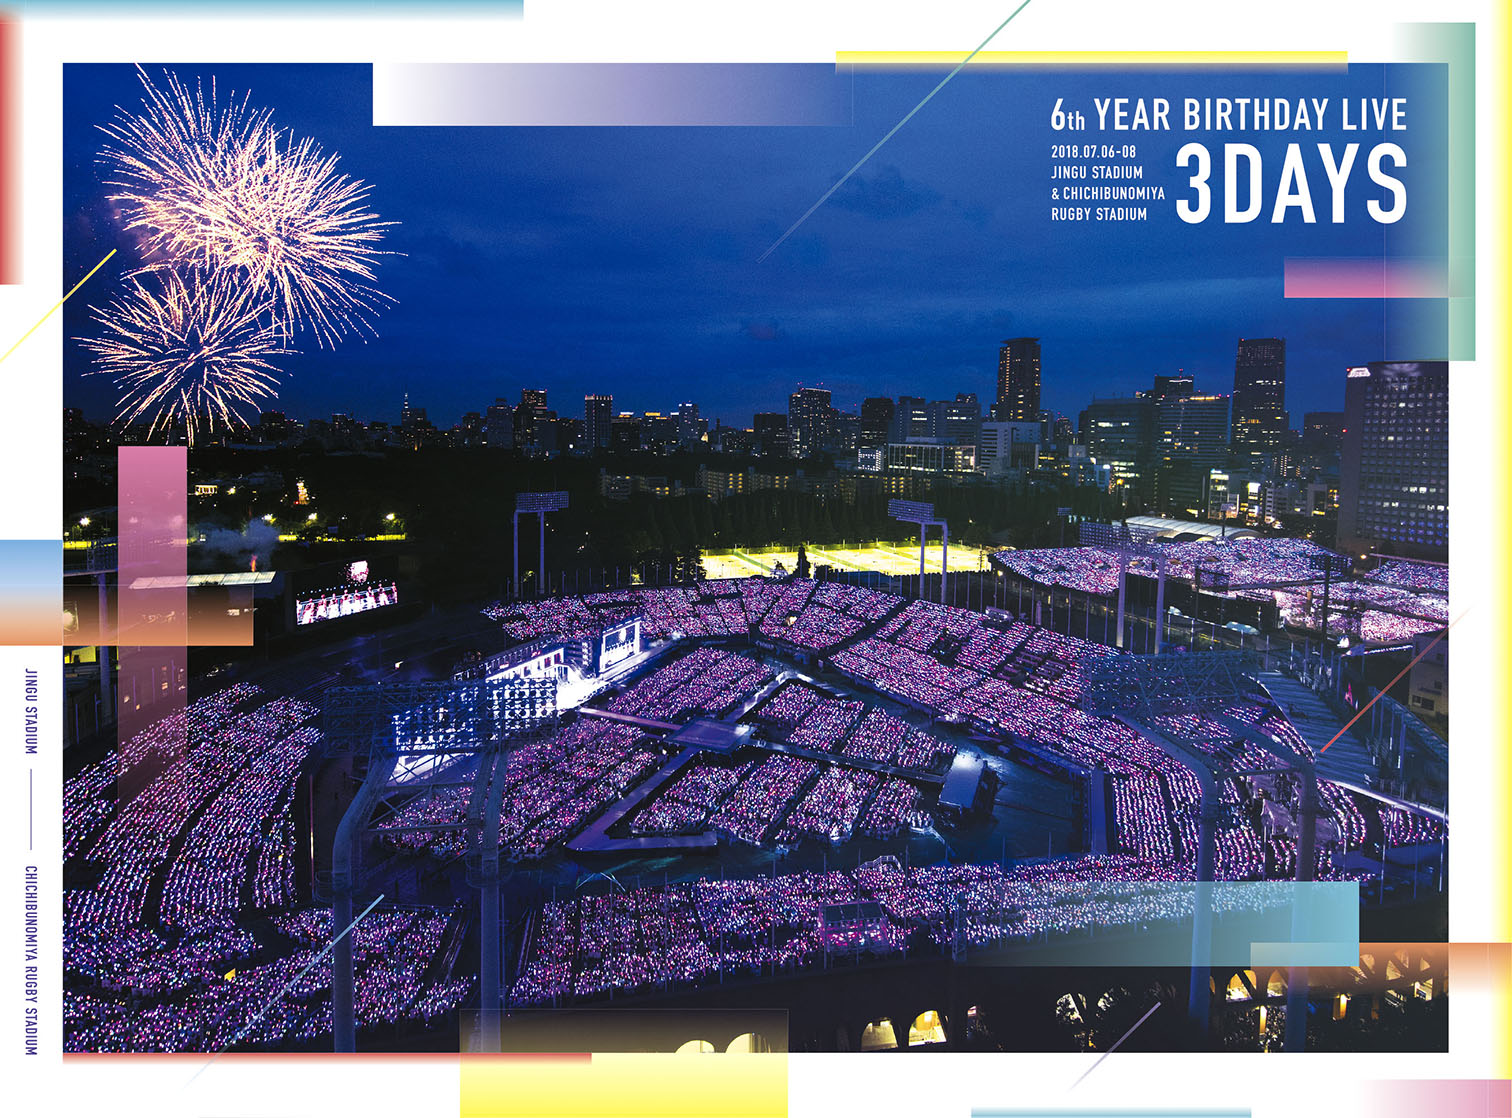 [蓝光原盘] 乃木坂46 6th YEAR BIRTHDAY LIVE 2018.07.06-08《完全生産限定版》《ISO 5碟167G》